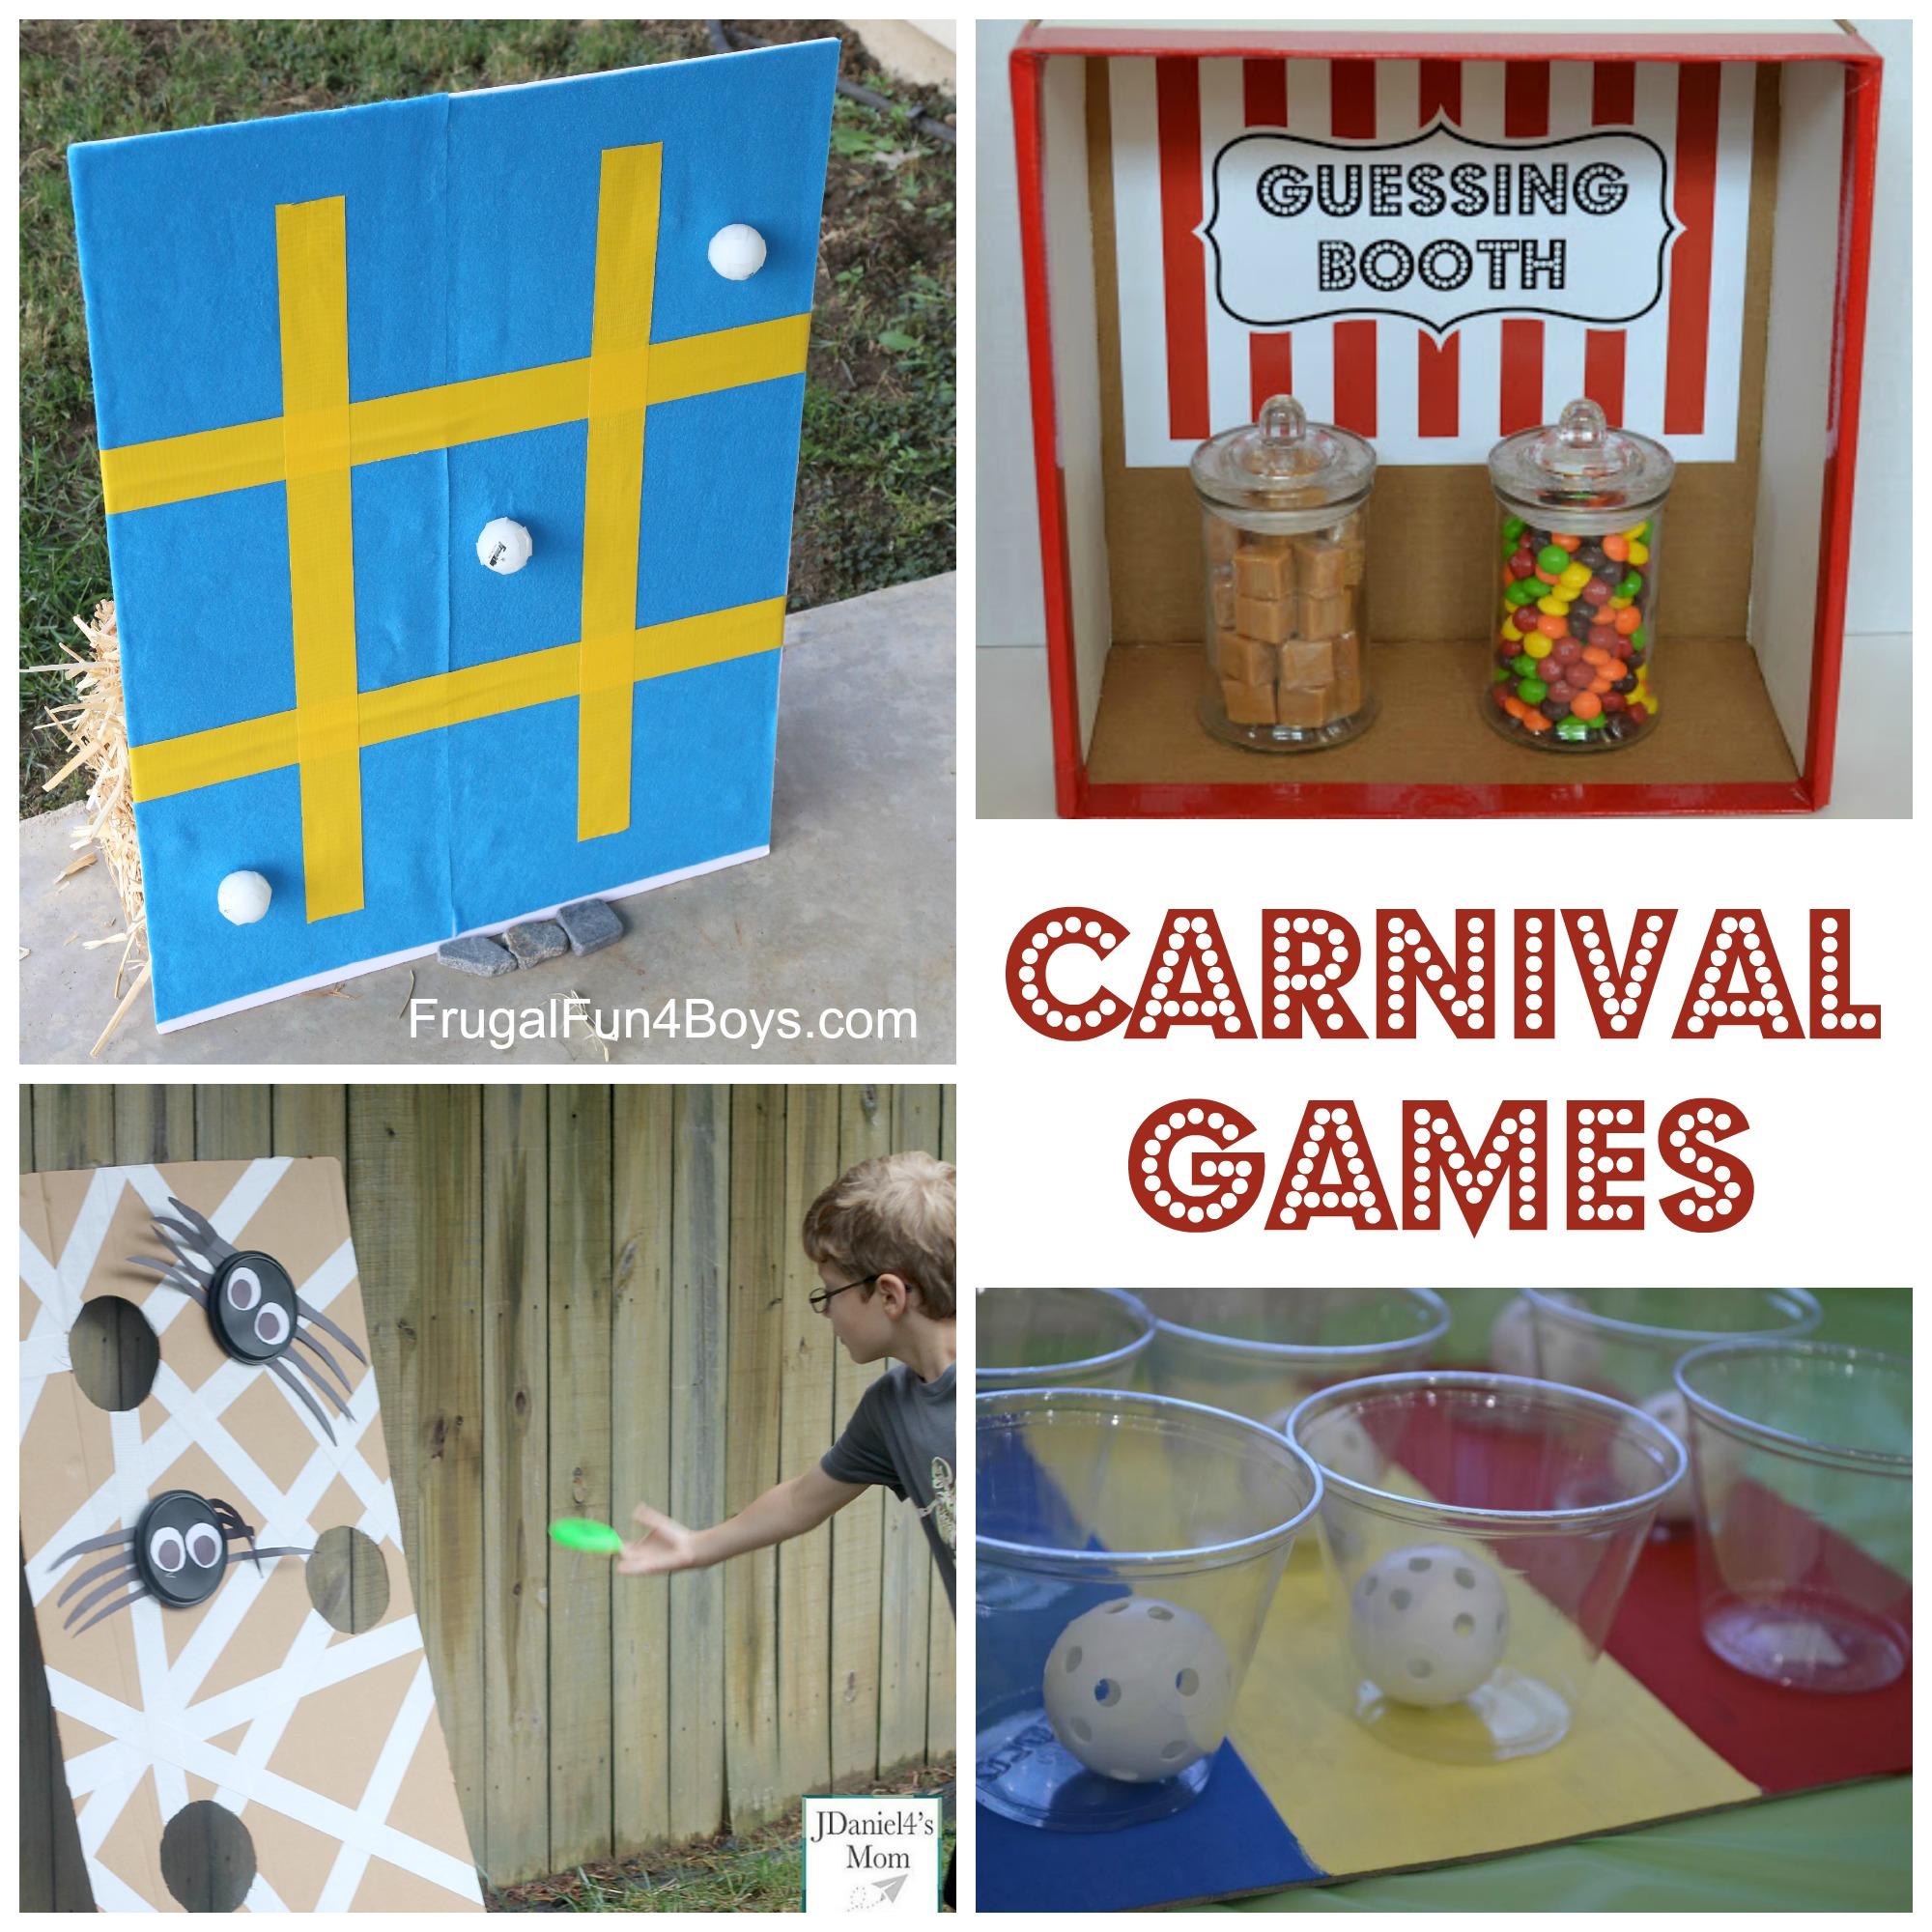 25+ Carnival Games for Kids